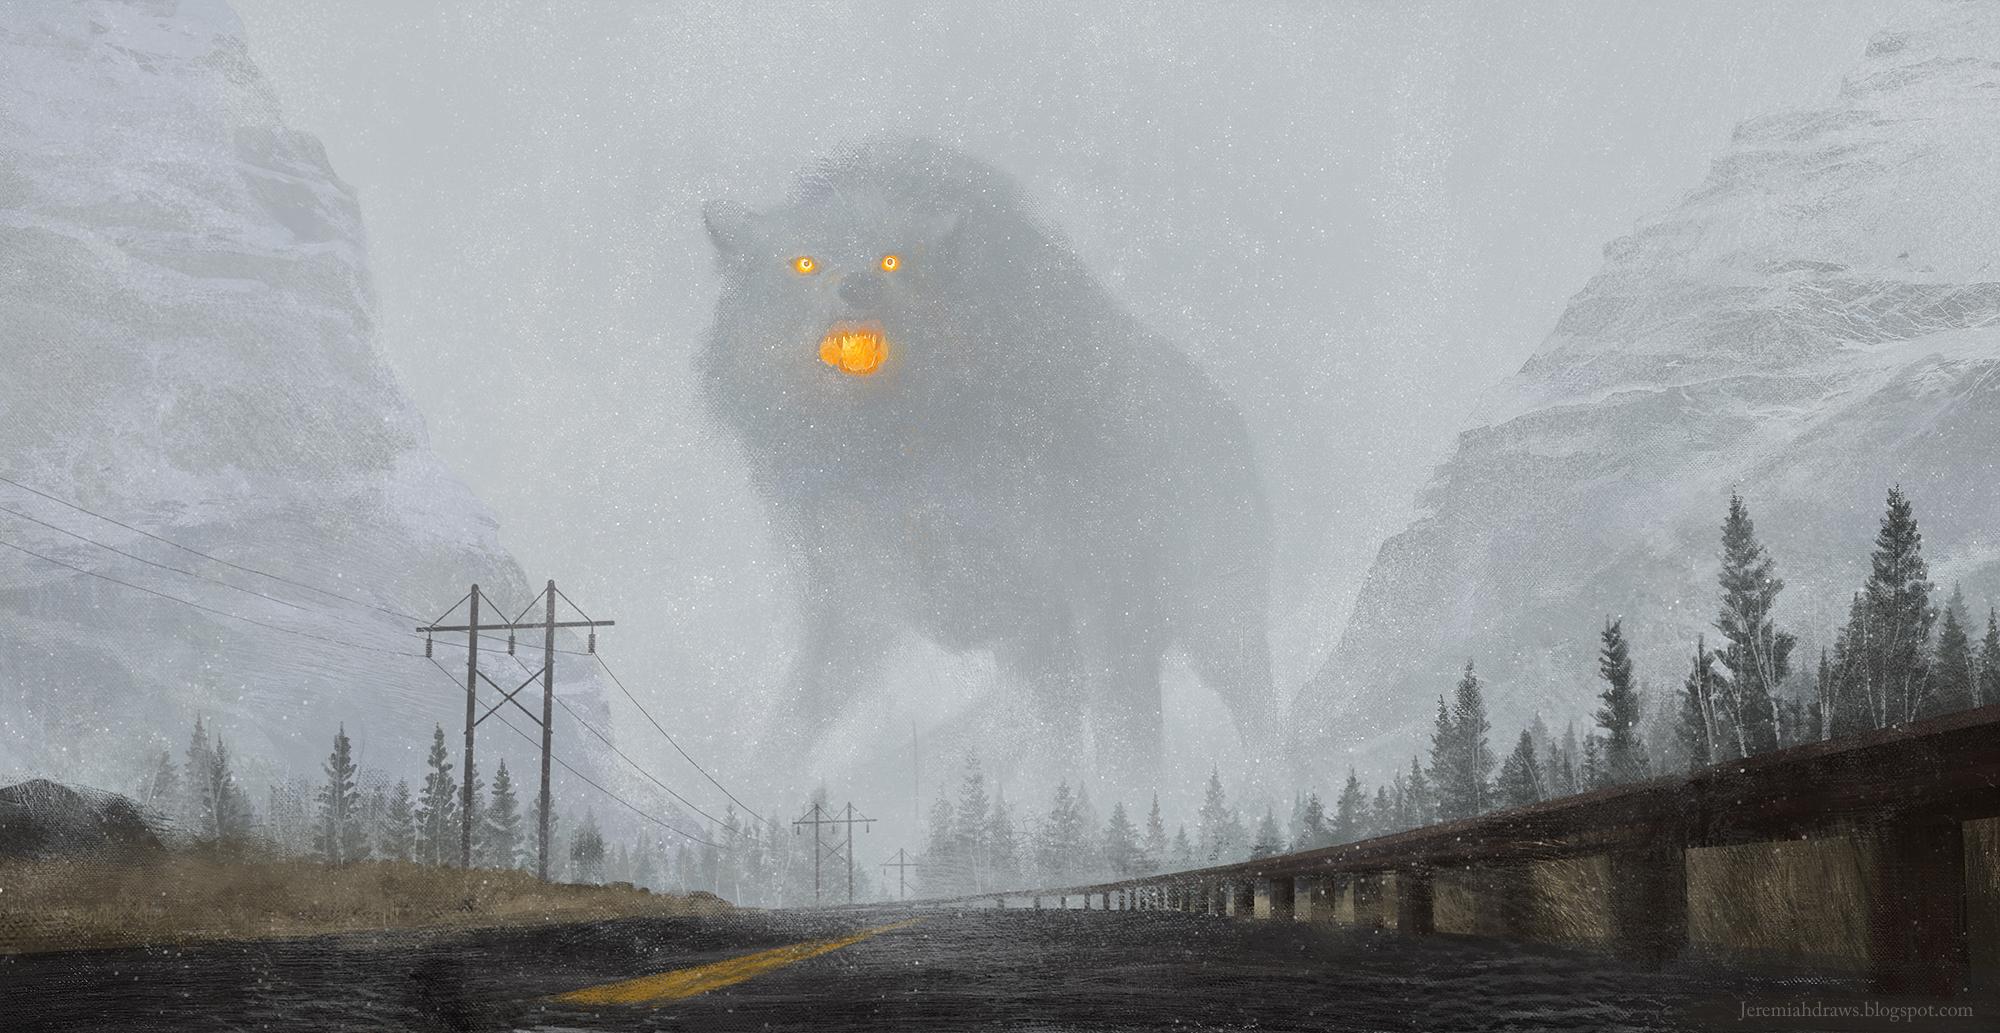 fenris_wolf_by_j_humphries-day3kkh.jpg